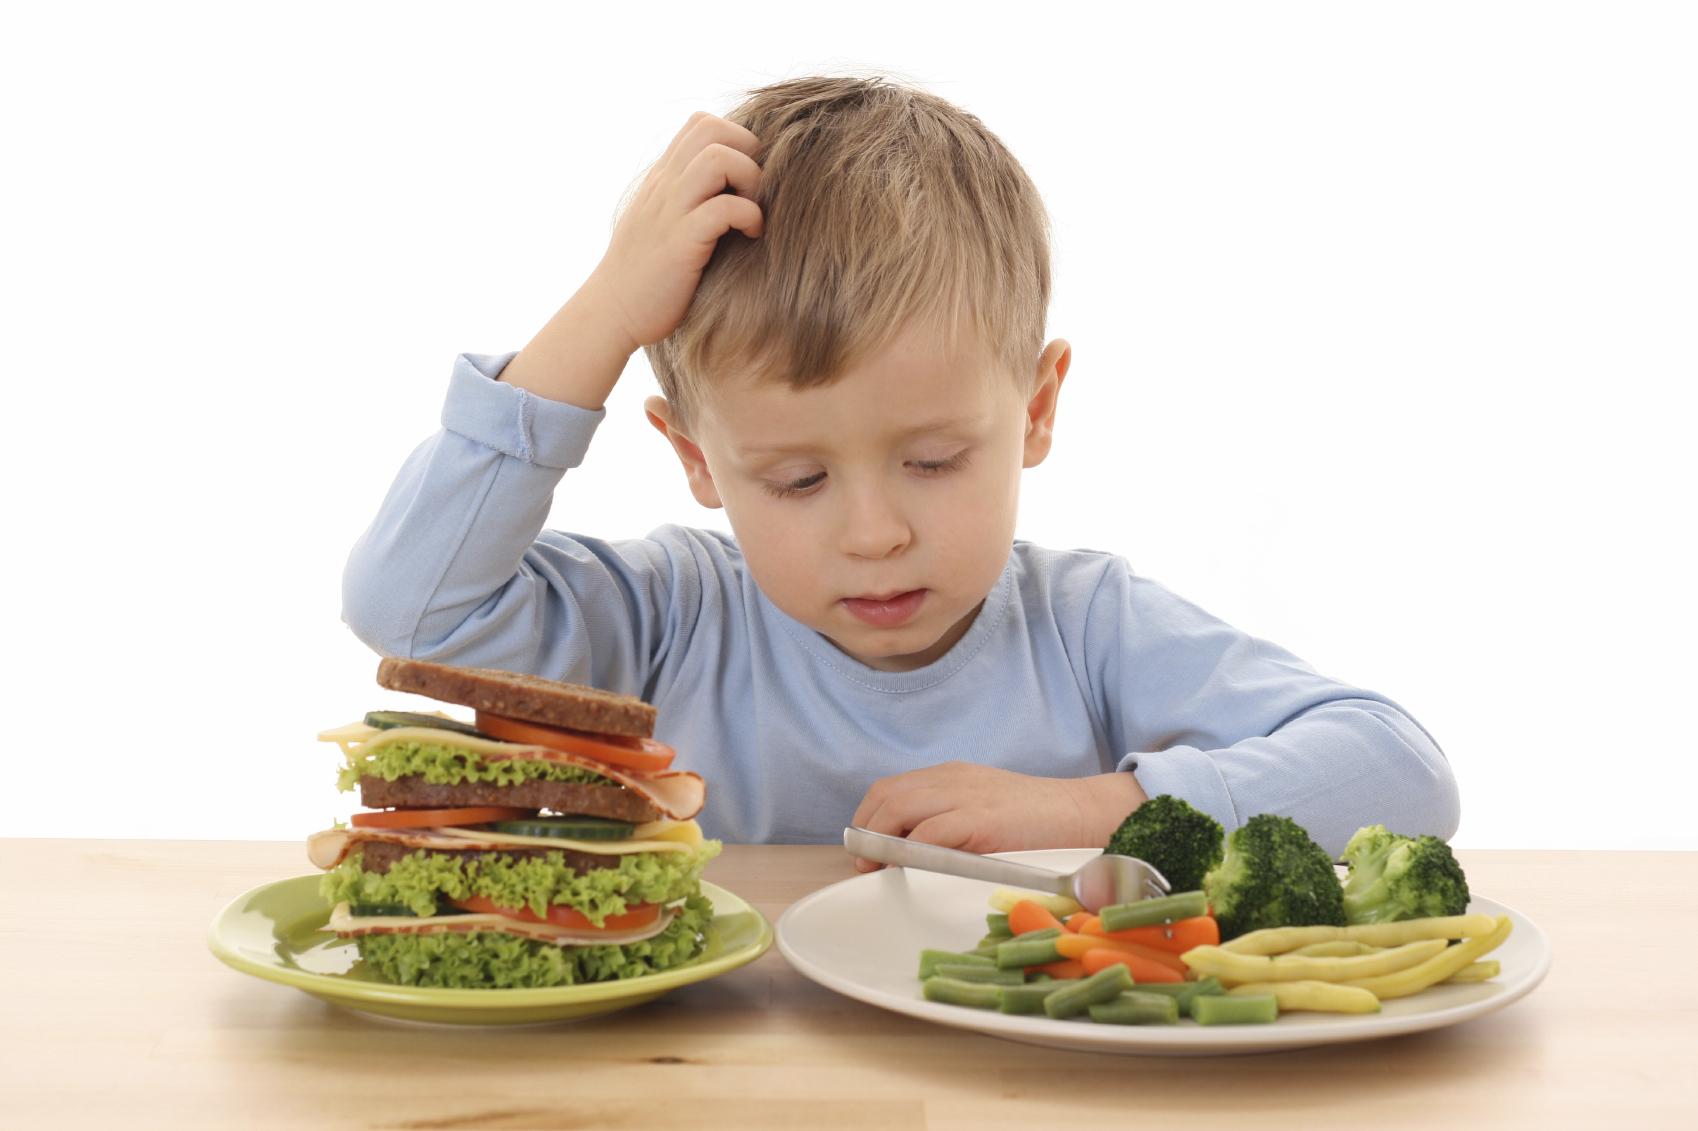 http://taghzie.ir/diet/life-cycle-diet/childhood-diet